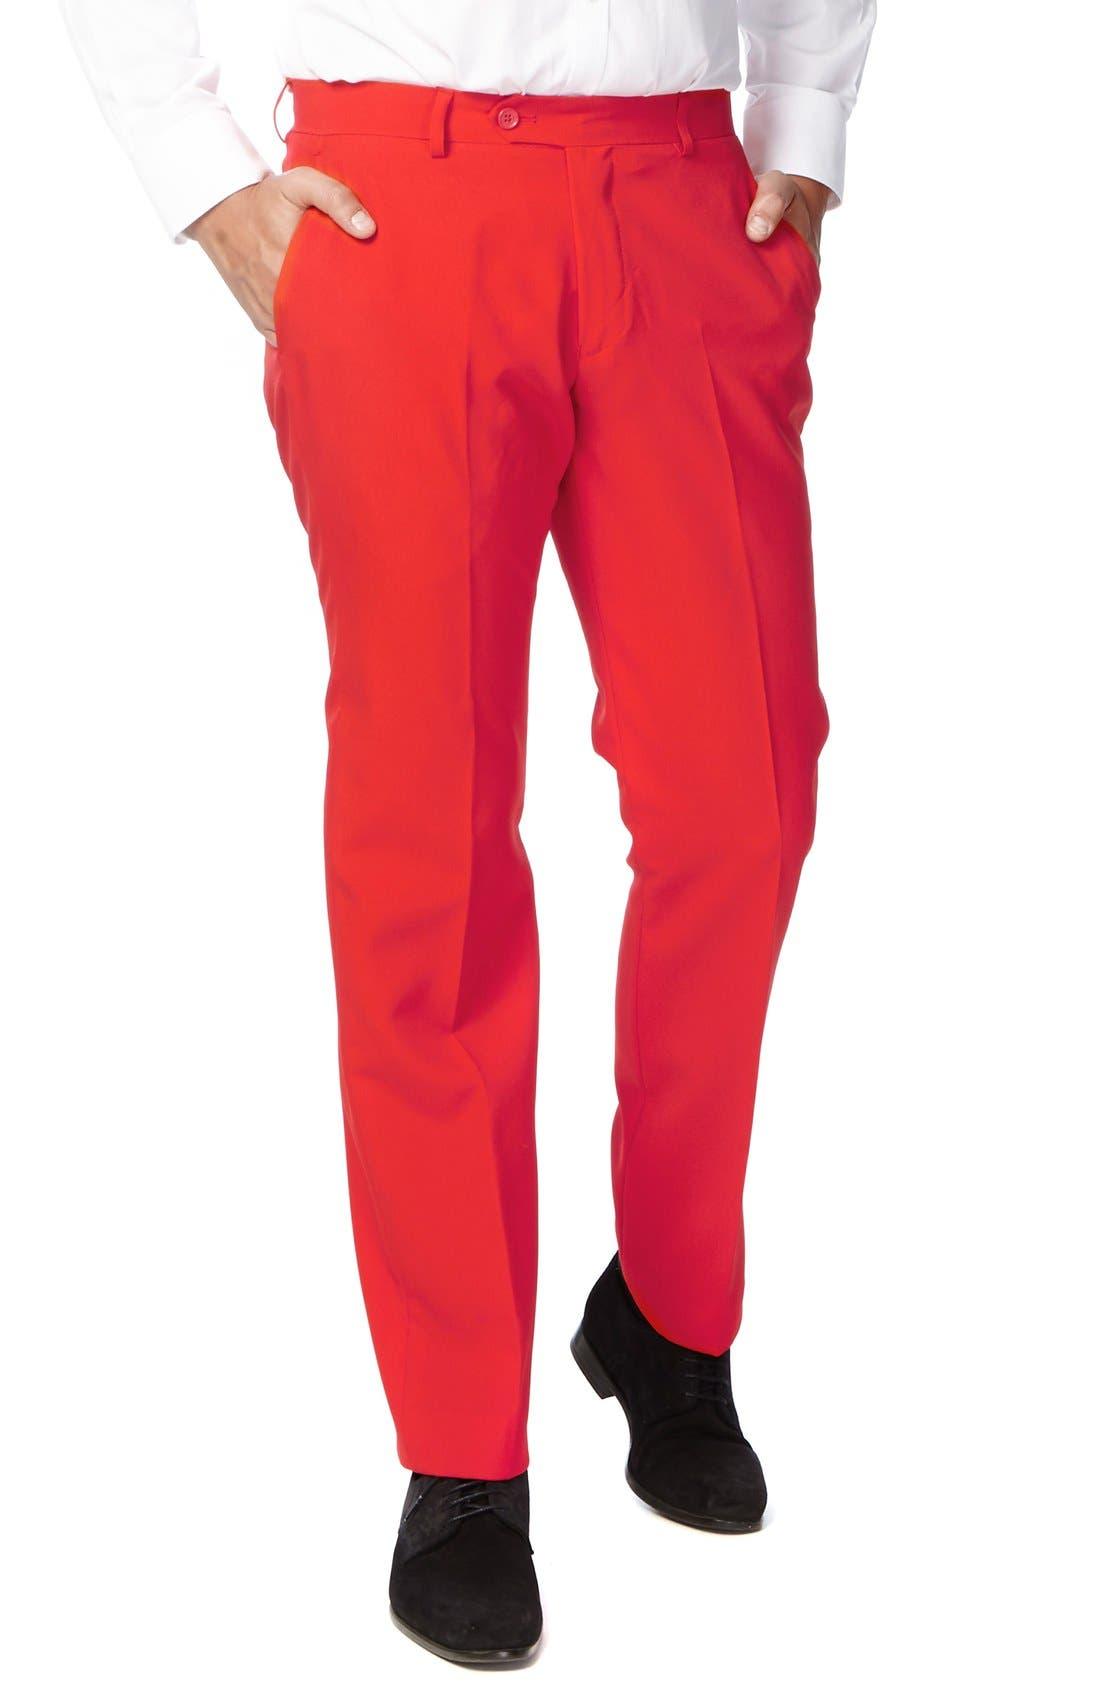 OppoSuit 'Red Devil' Trim Fit Two-Piece Suit with Tie,                             Alternate thumbnail 3, color,                             610